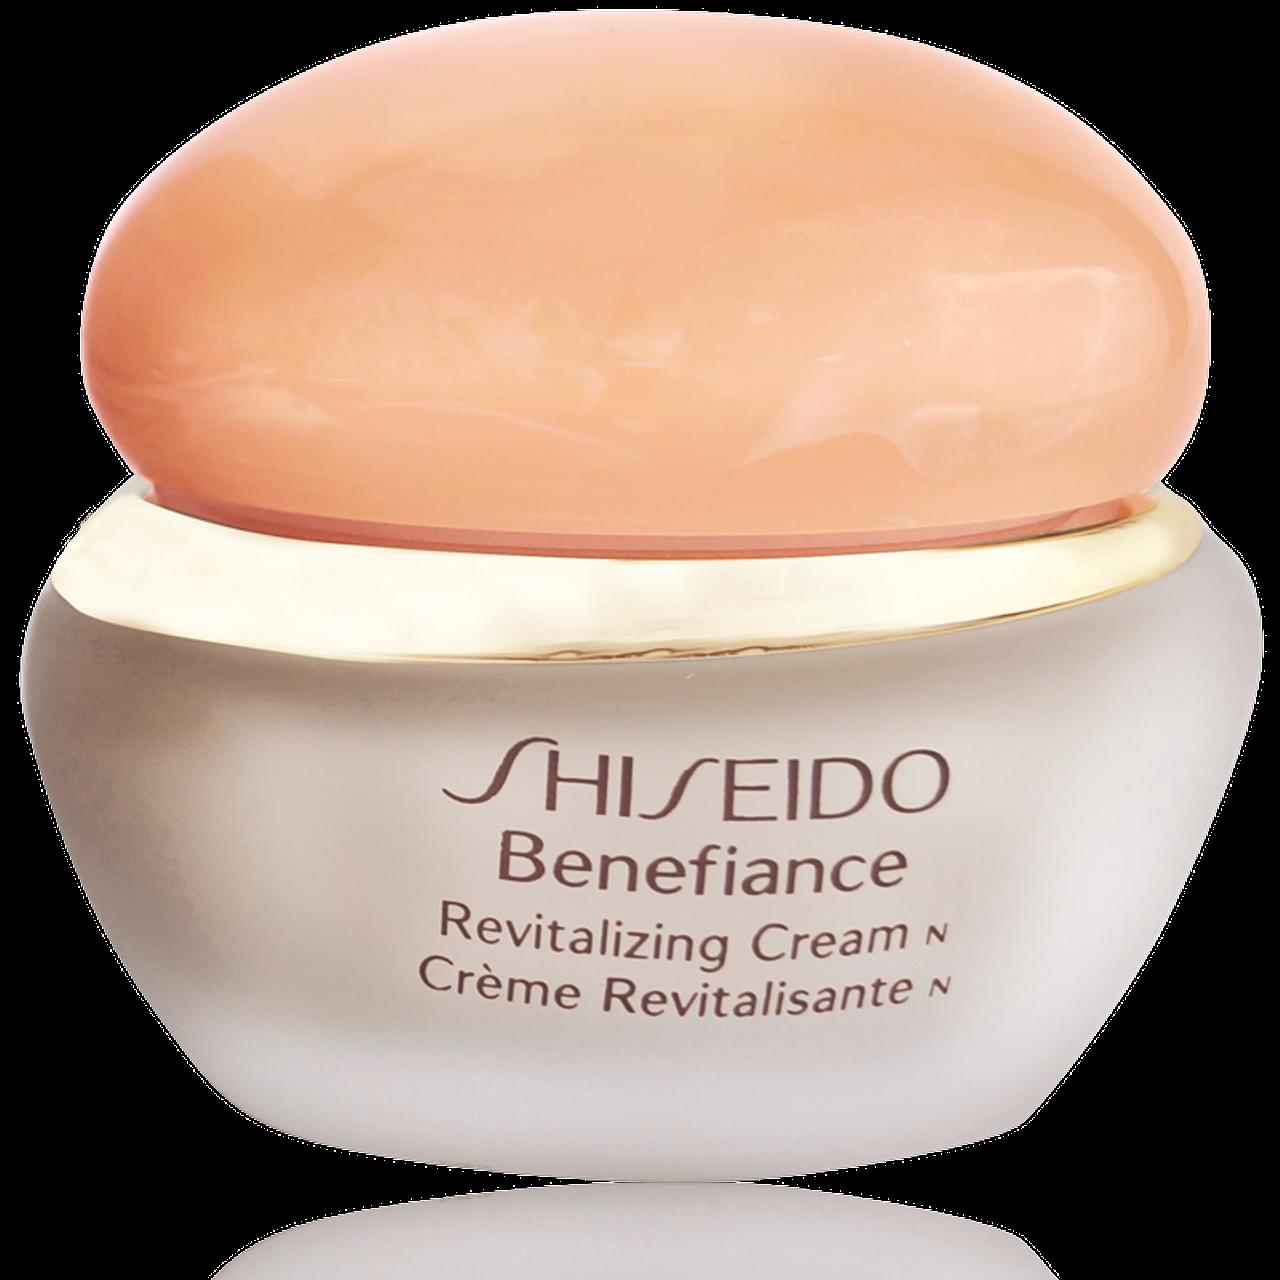 Shiseido Benefiance Revitalizing Cream N 40ml